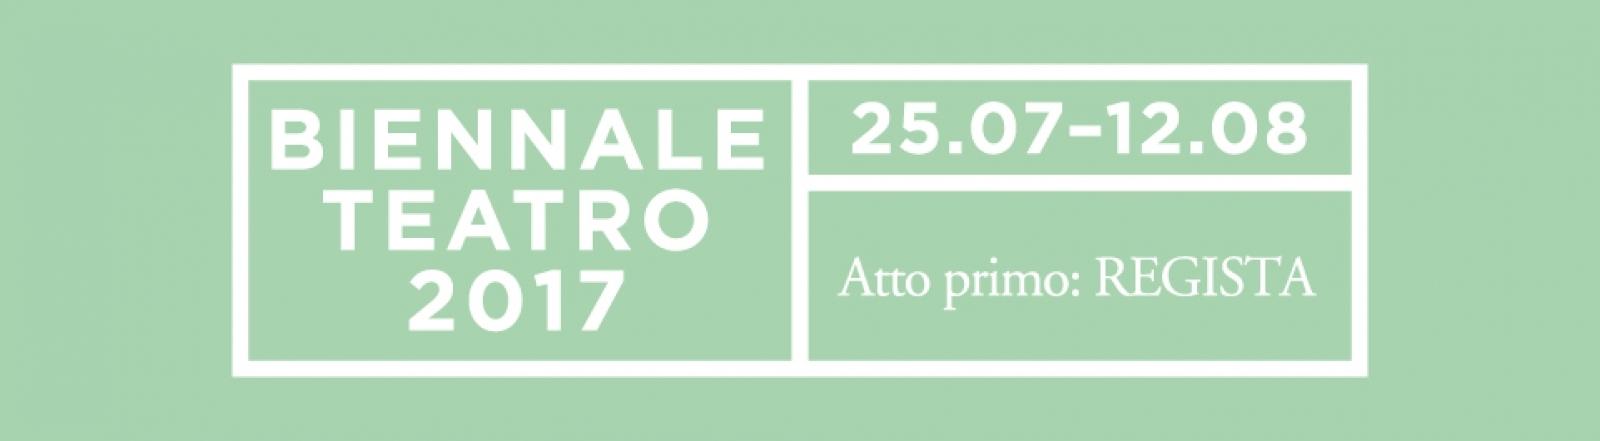 "Poster of ""Biennale Teatro 2017 Atto primo: Regista"""